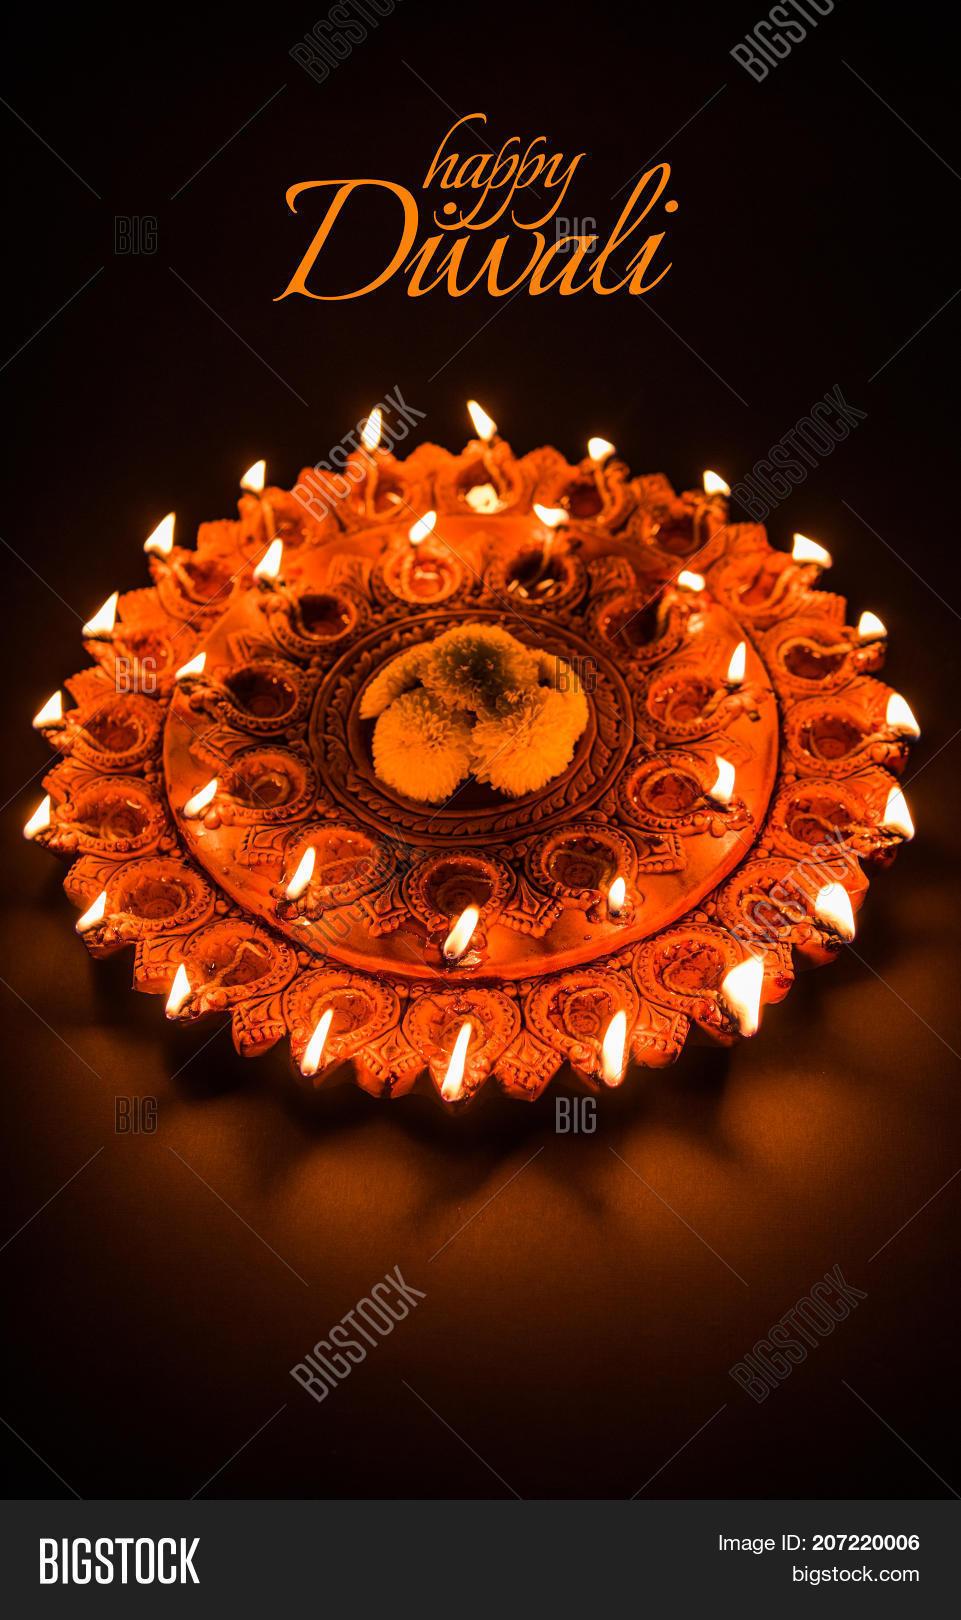 Happy diwali greeting image photo free trial bigstock happy diwali greeting card design using beautiful clay diya lamps lit on diwali night celebration m4hsunfo